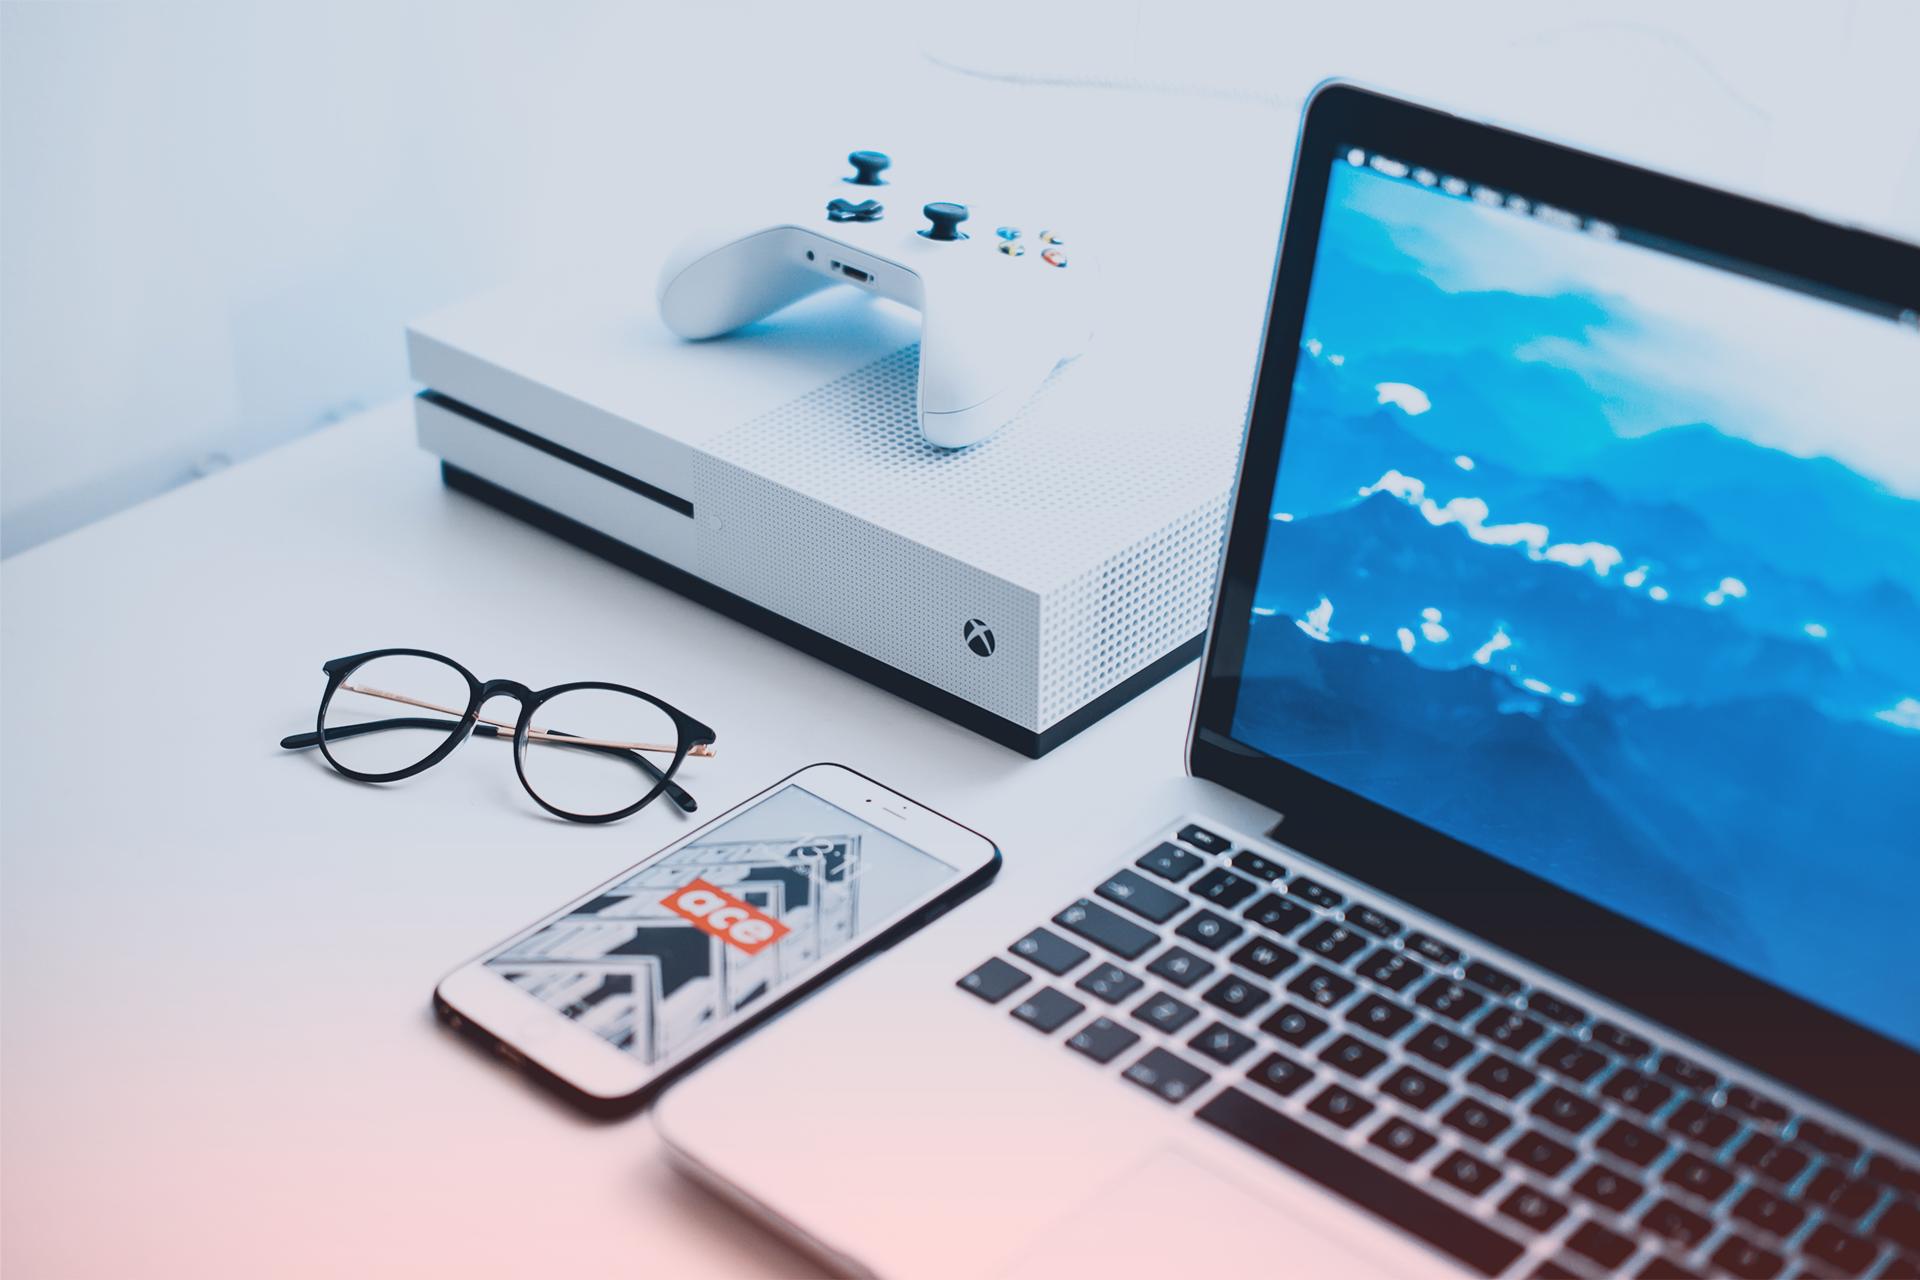 gamificatino console ordinateur portable